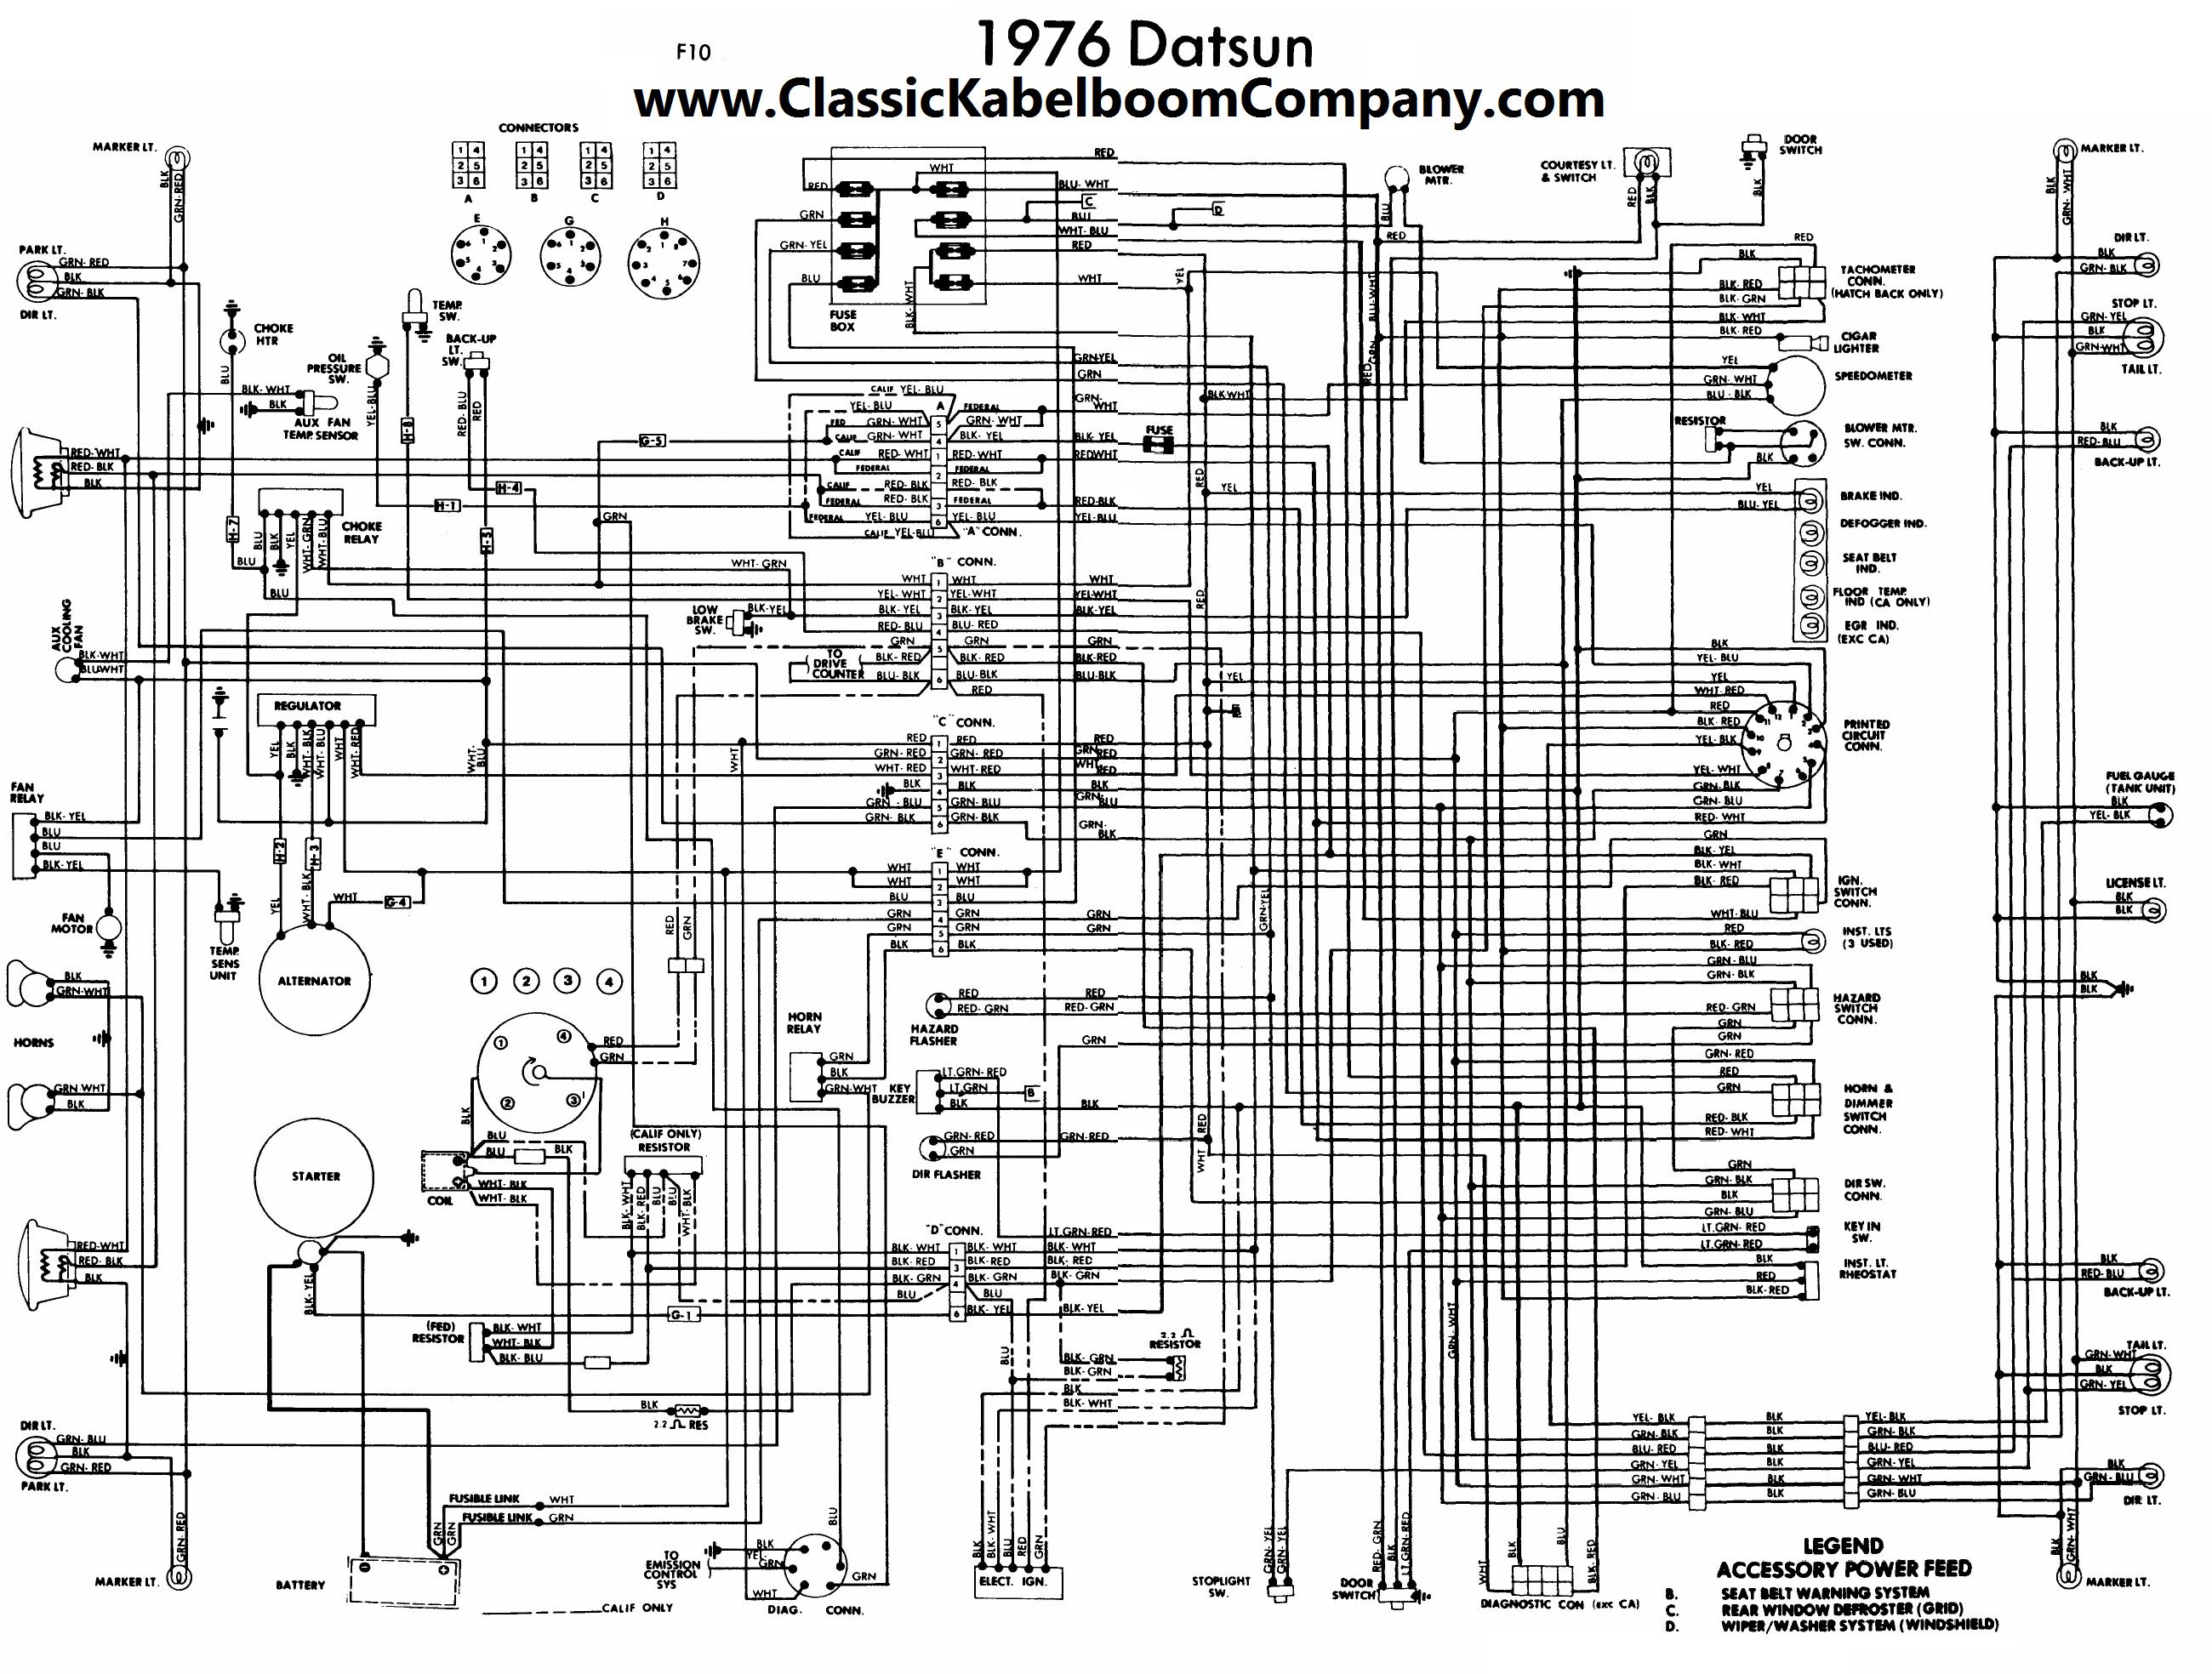 Classic Kabelboom Company - Elektrisch bedrading schema ...